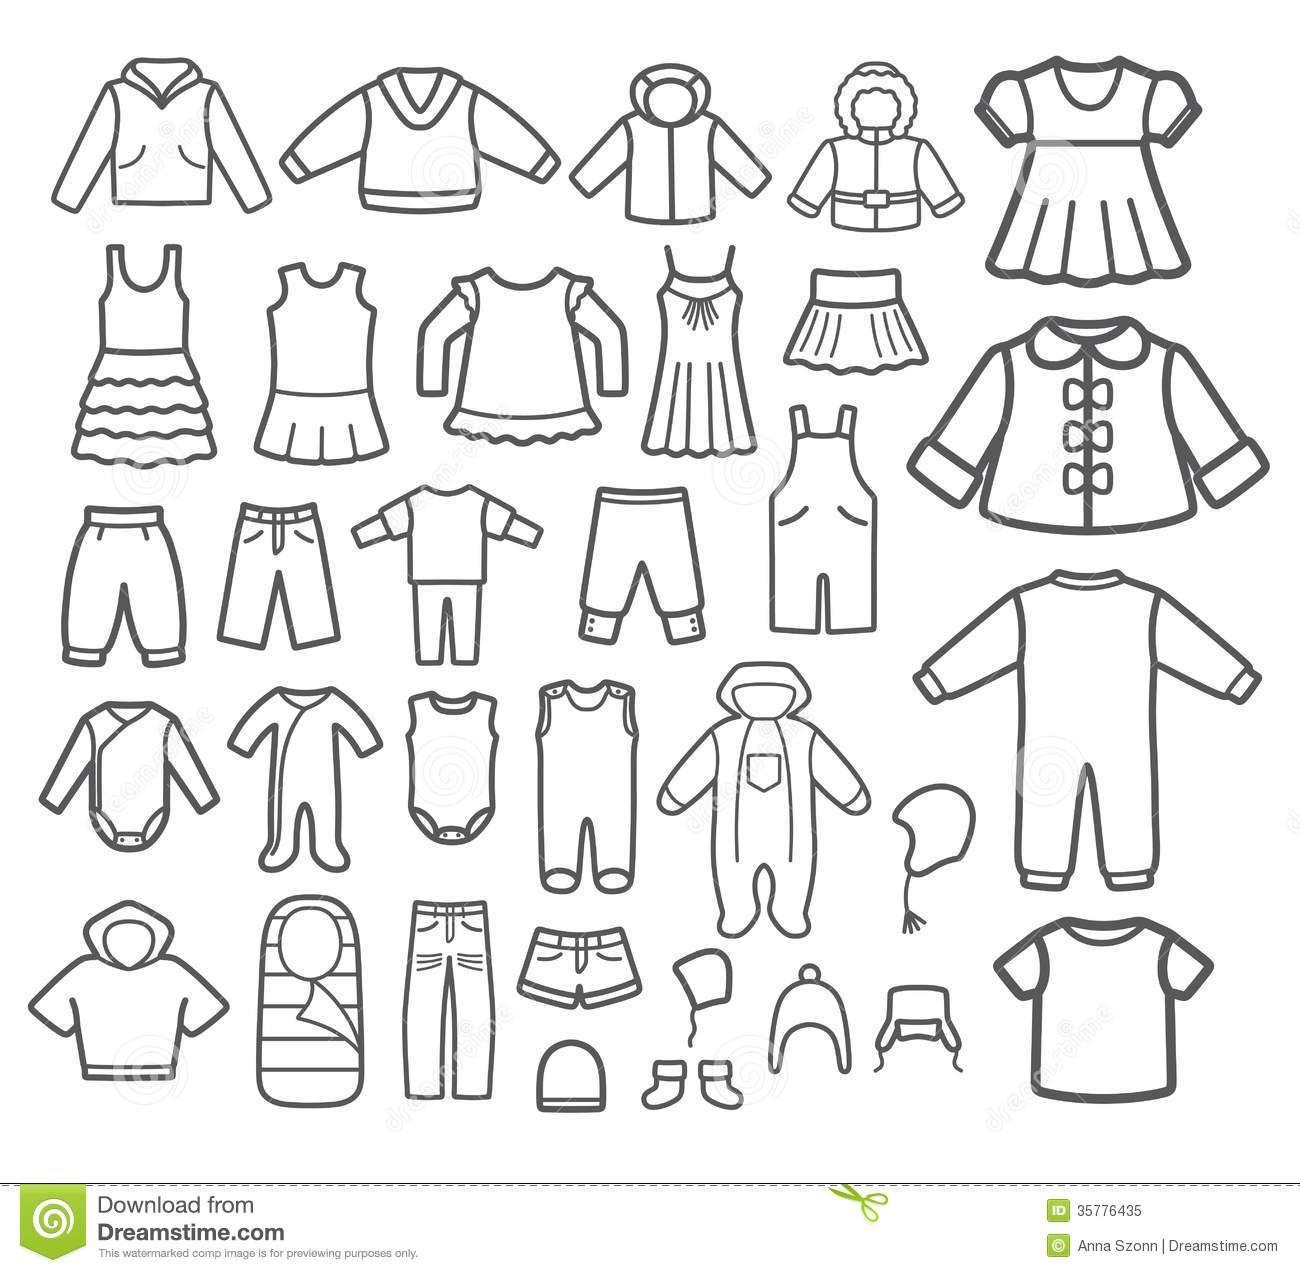 Clothes clipart black and estausten pinterest